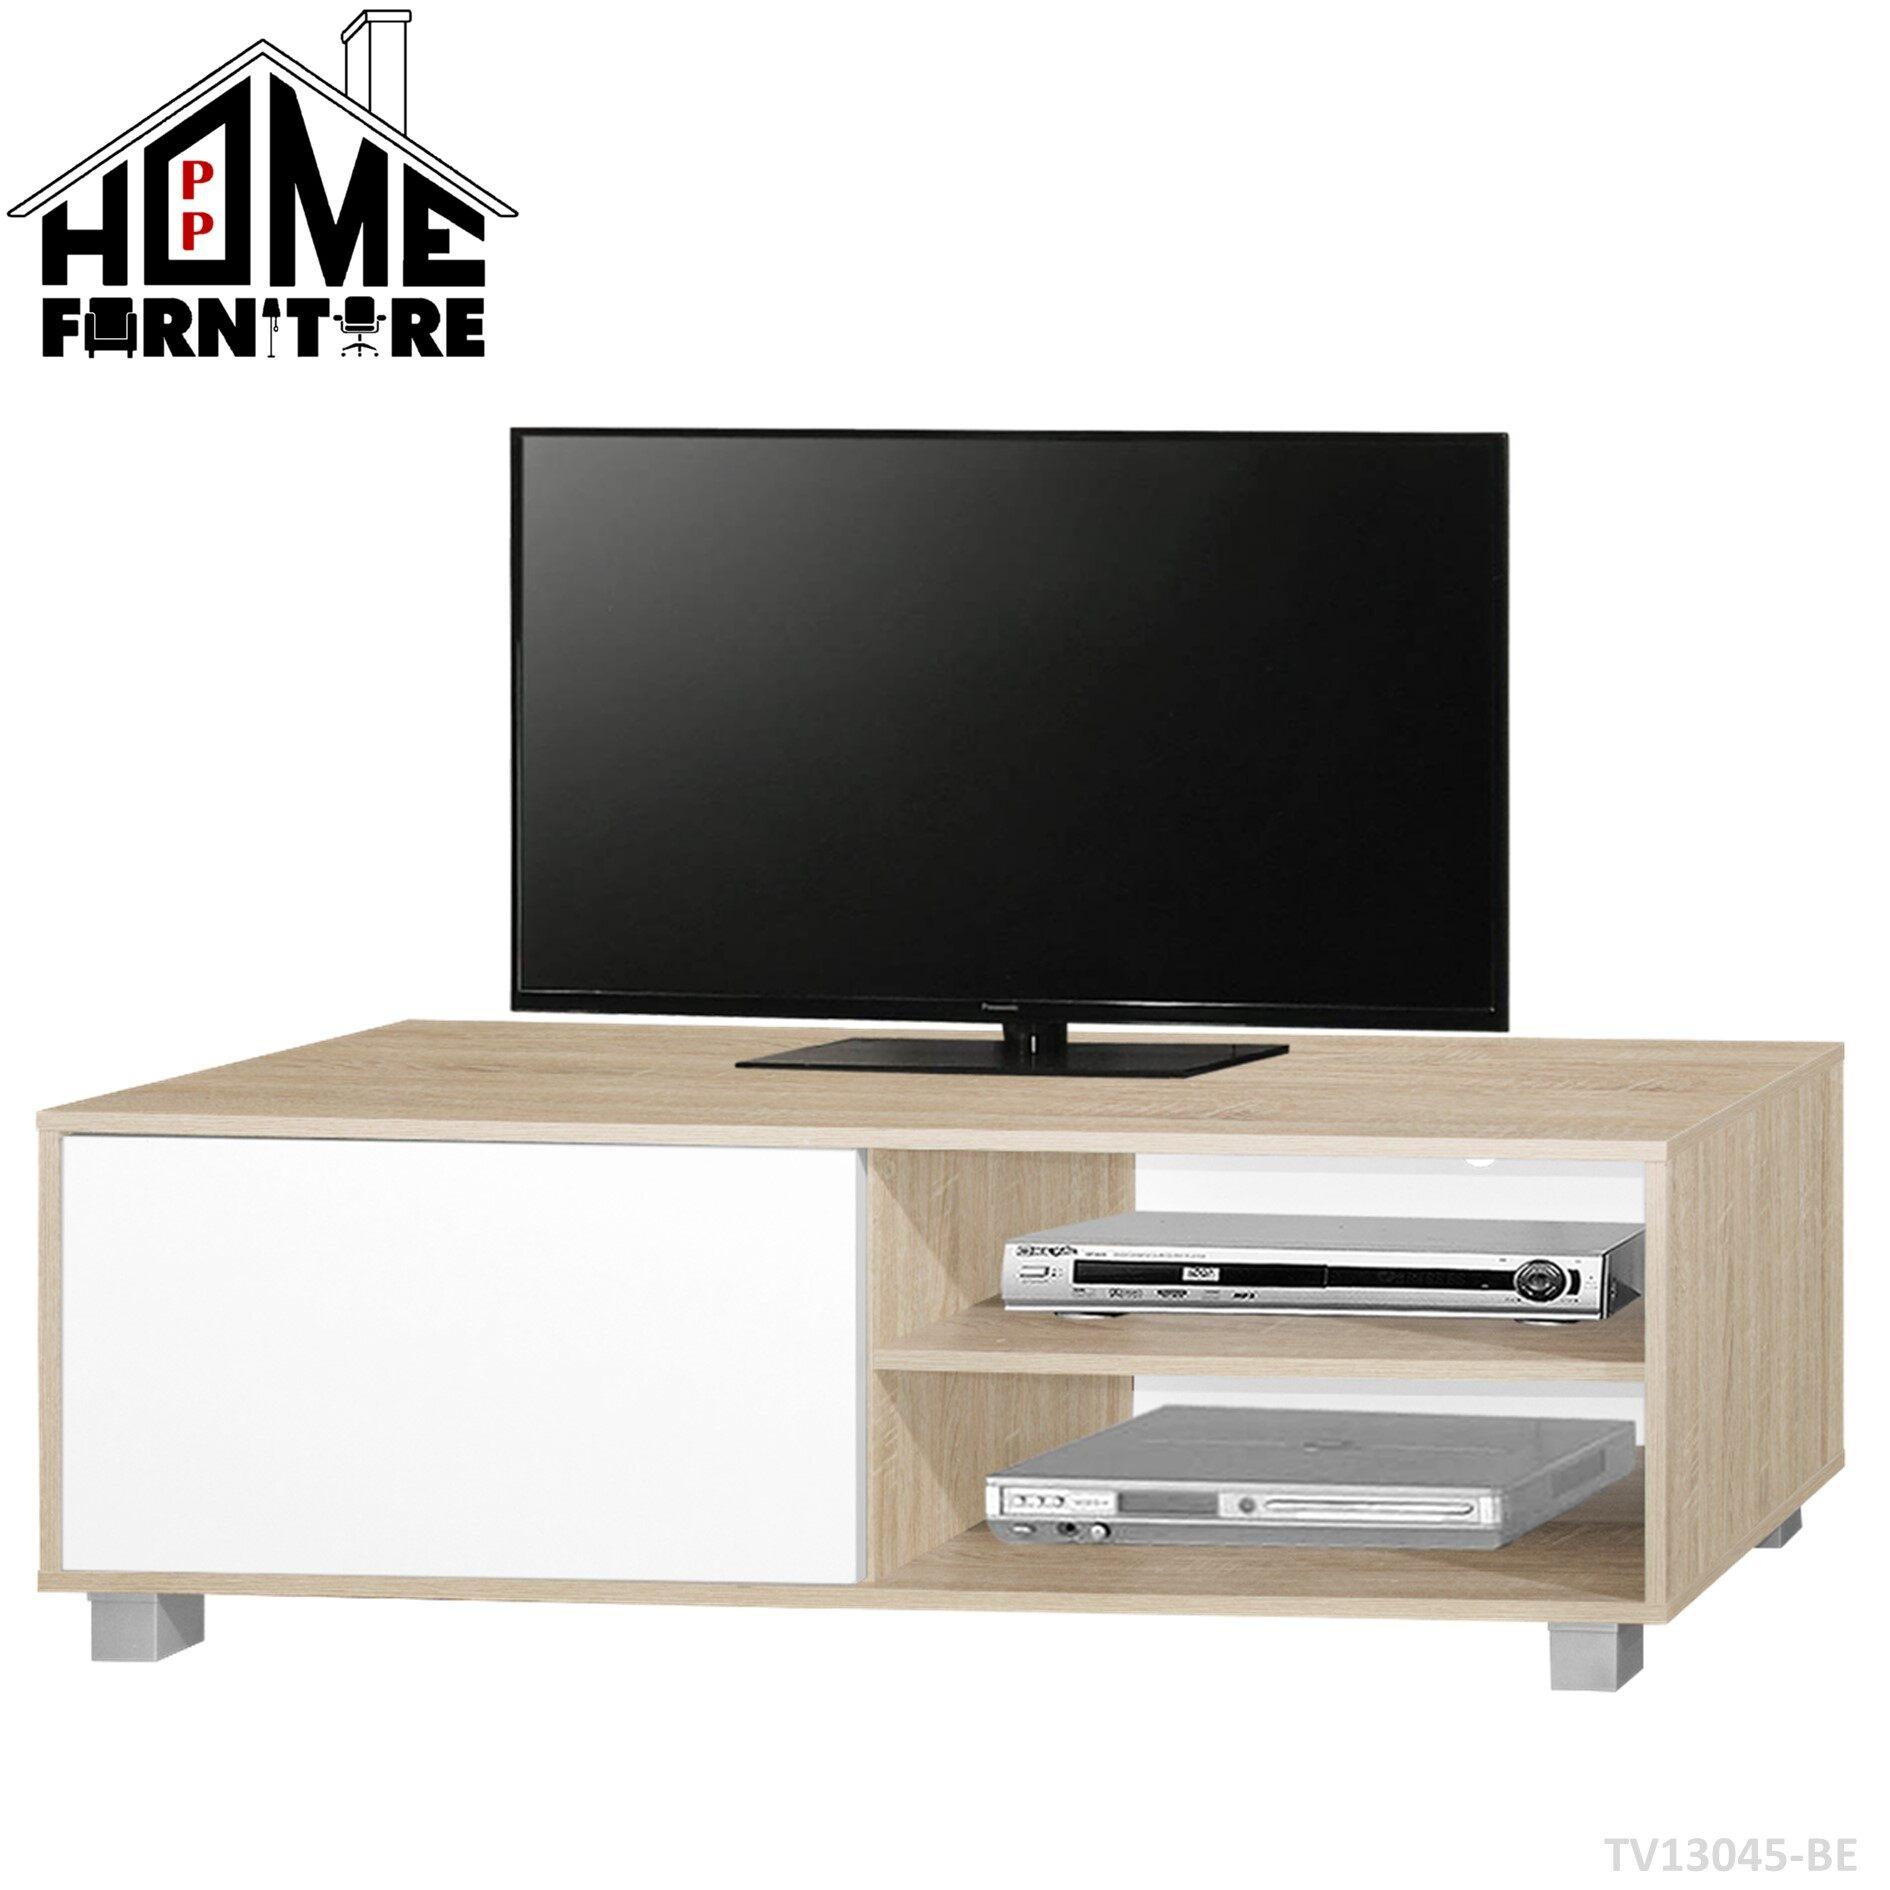 PP HOME TV cabinet modern set with door/Television cabinet/TV console/TV rack/TV table media storage/TV storage organizer/ Almari TV/Kabinet TV/Rak TV/Meja TV 电视柜/电视橱/电视桌TV13045-BE